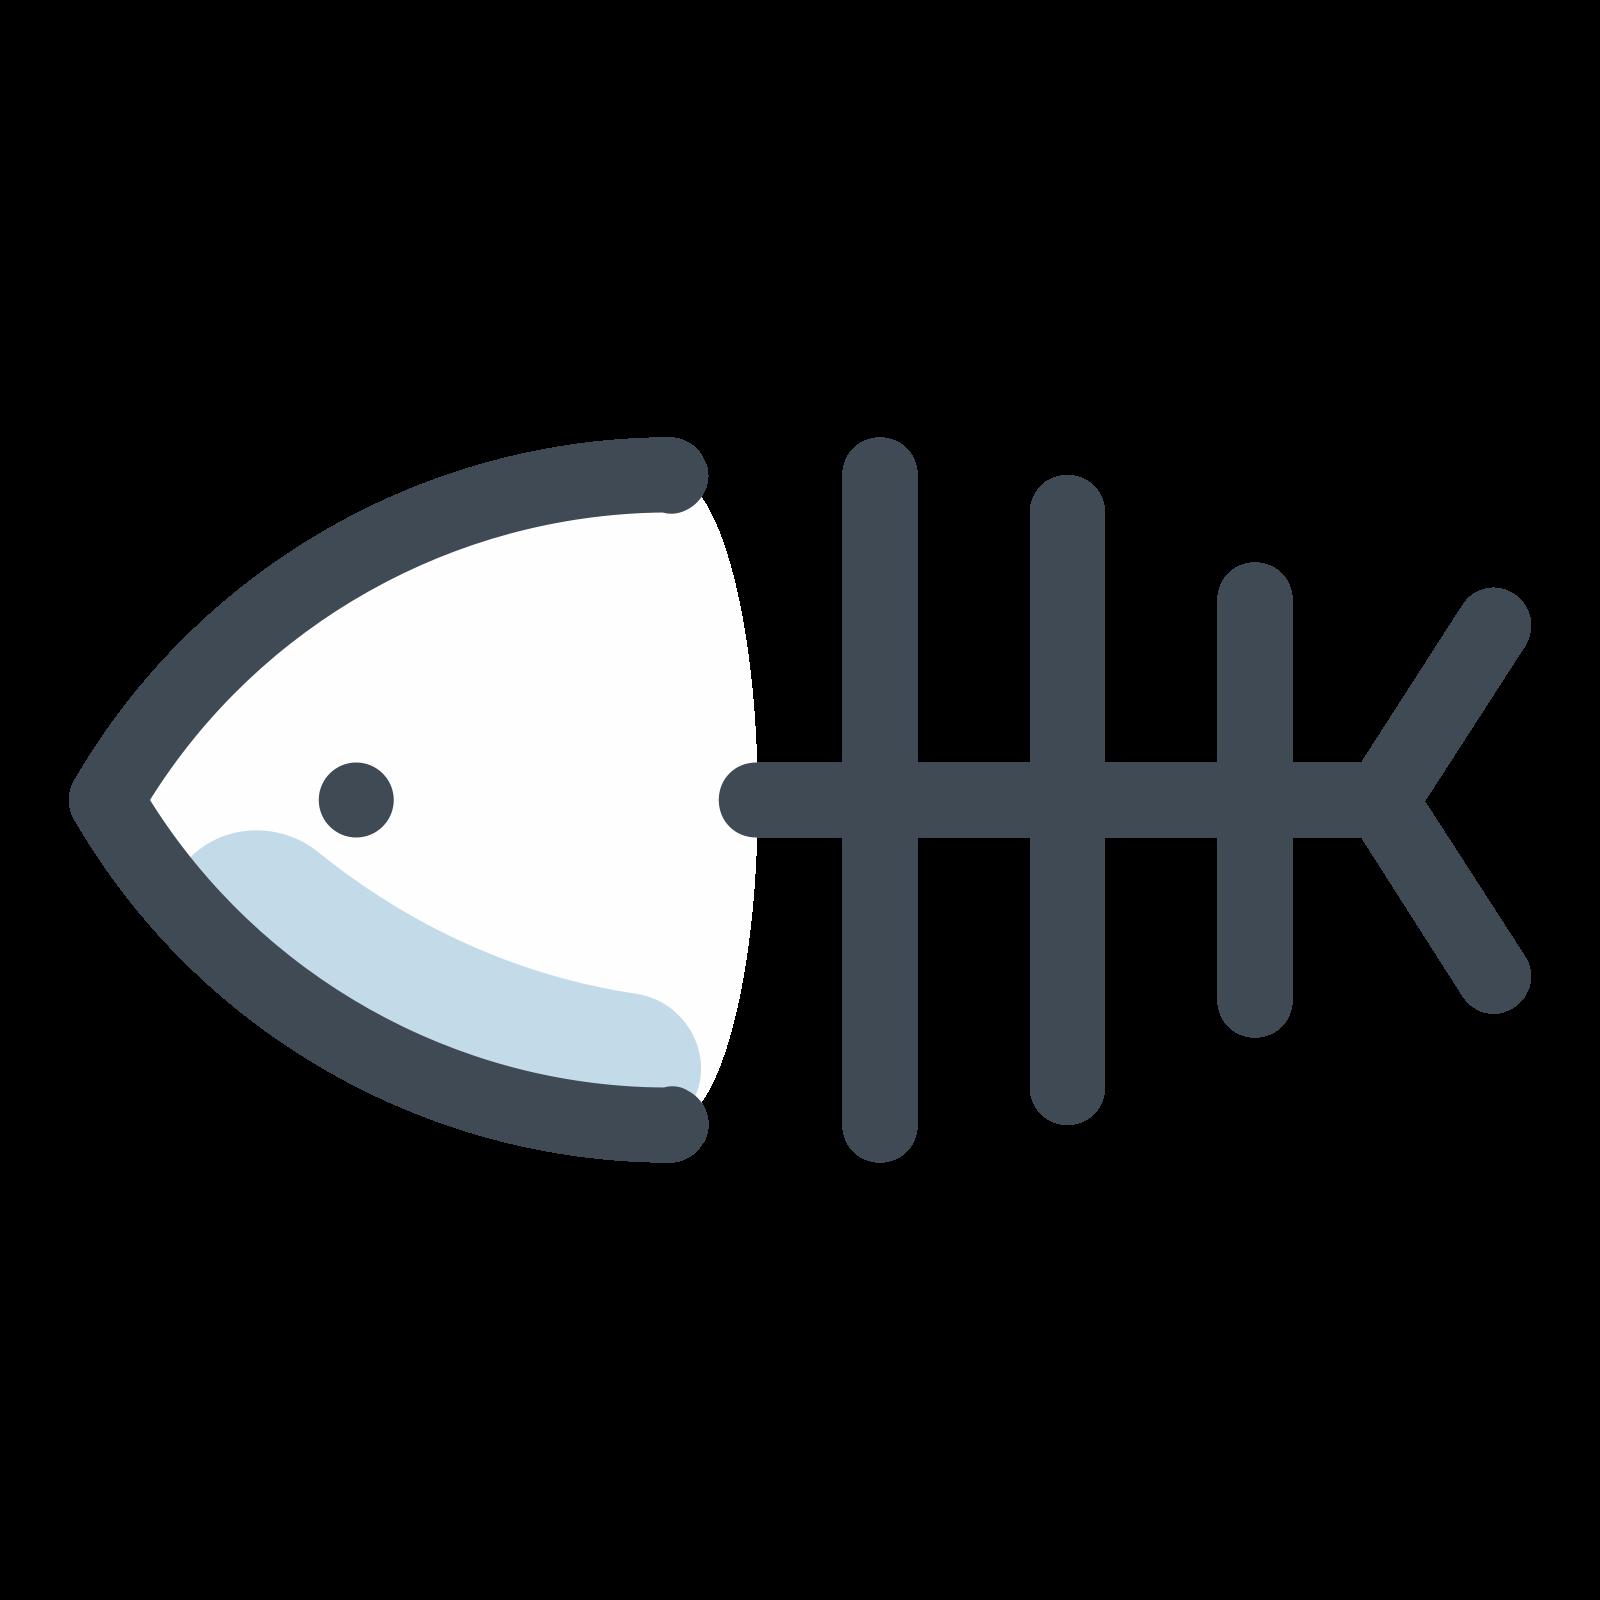 Fish skeleton clipart clip transparent stock Fish Skeleton アイコン - 無料ダウンロード、PNG およびベクター clip transparent stock